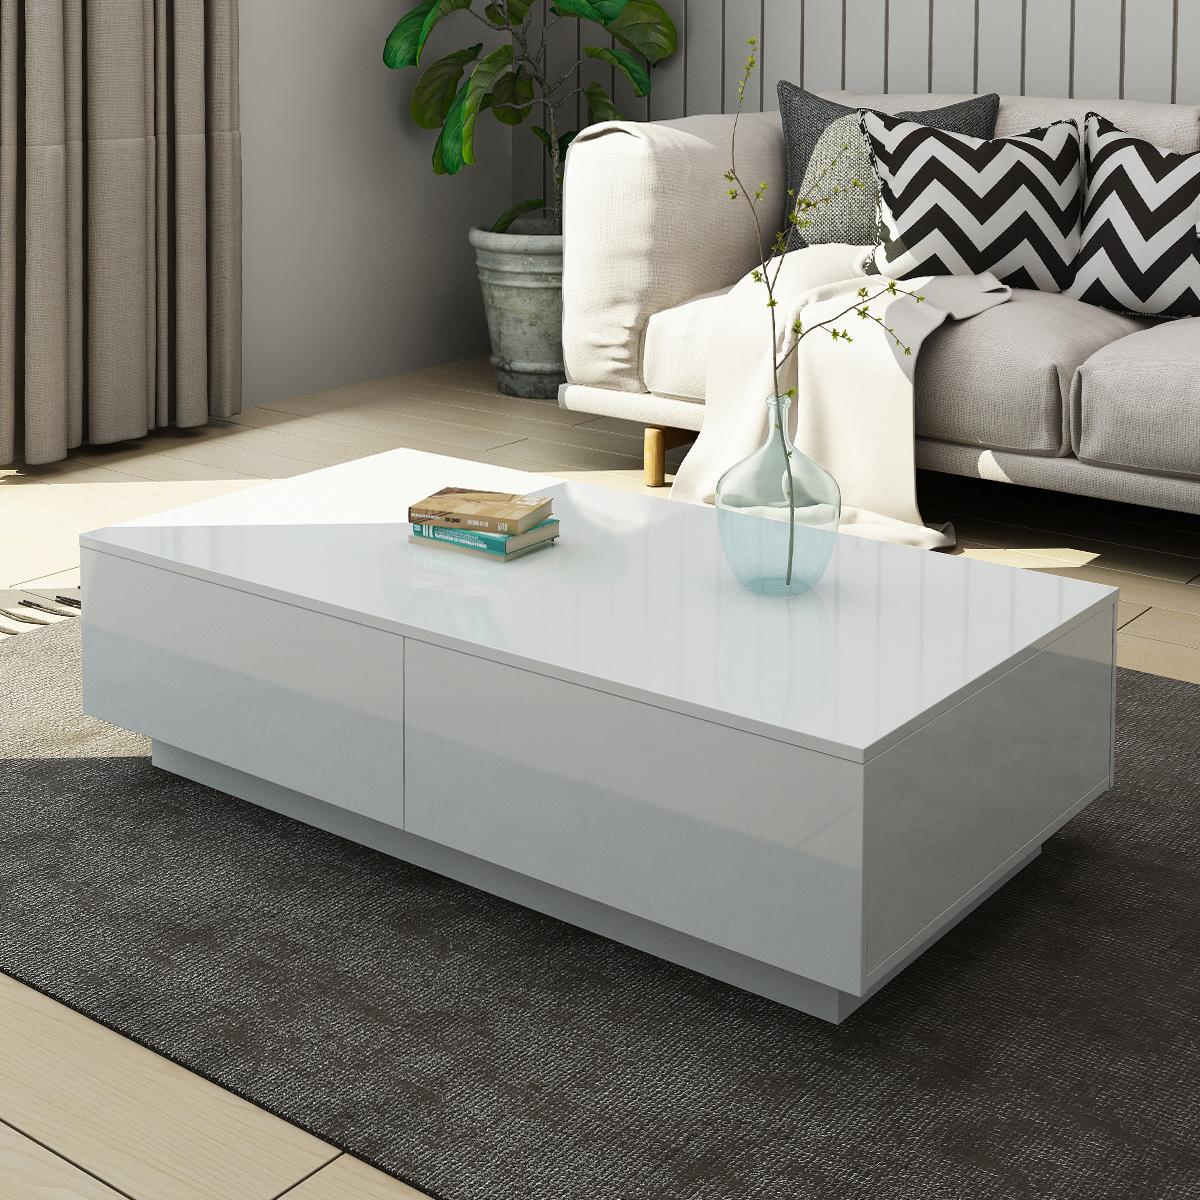 modern coffee table 4 drawer storage shelf high gloss wood living room furniture white other home decor